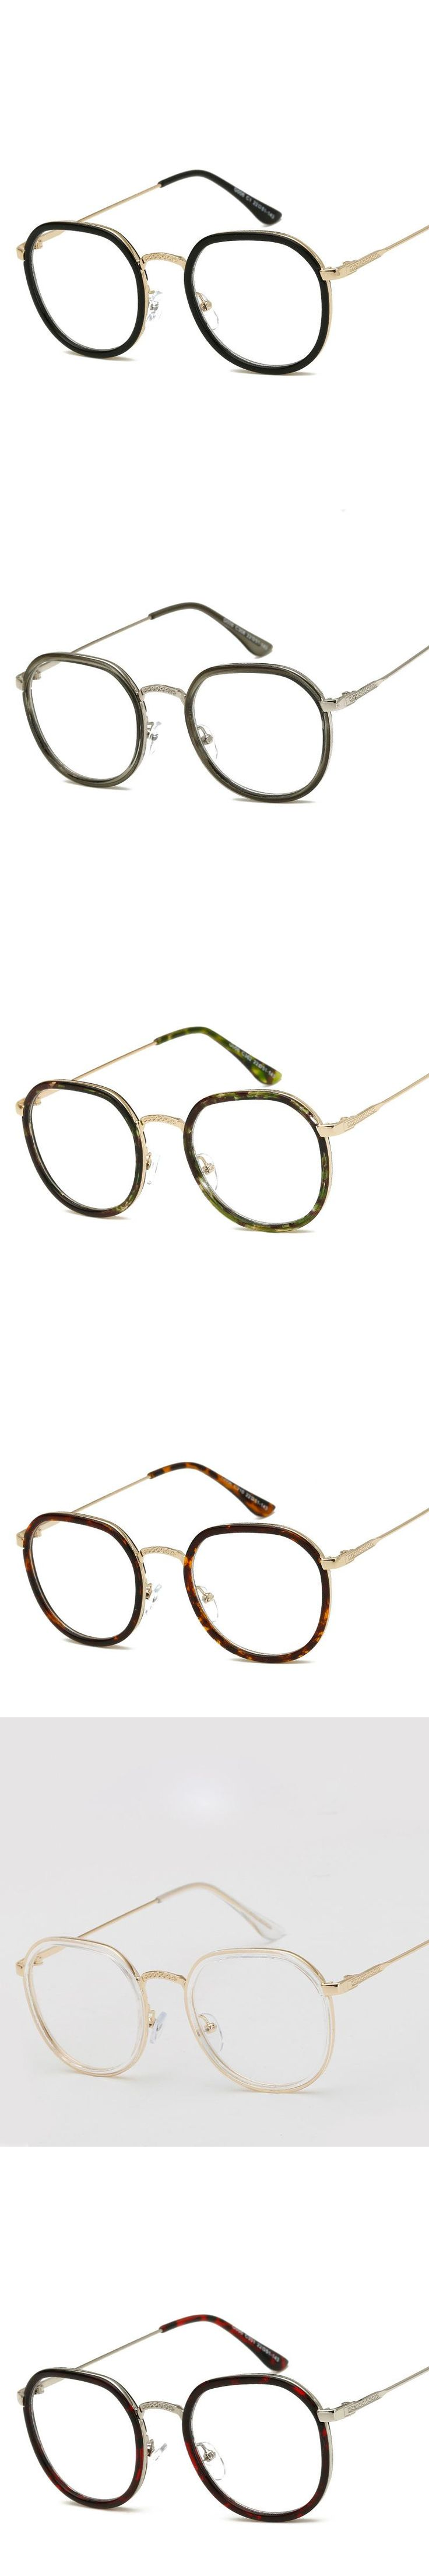 Brand Design Vintage Grade Eyewear Frames Optical Frame Eye Glasses Frames for Women Men Male Eyeglass Oculos De Grau G006